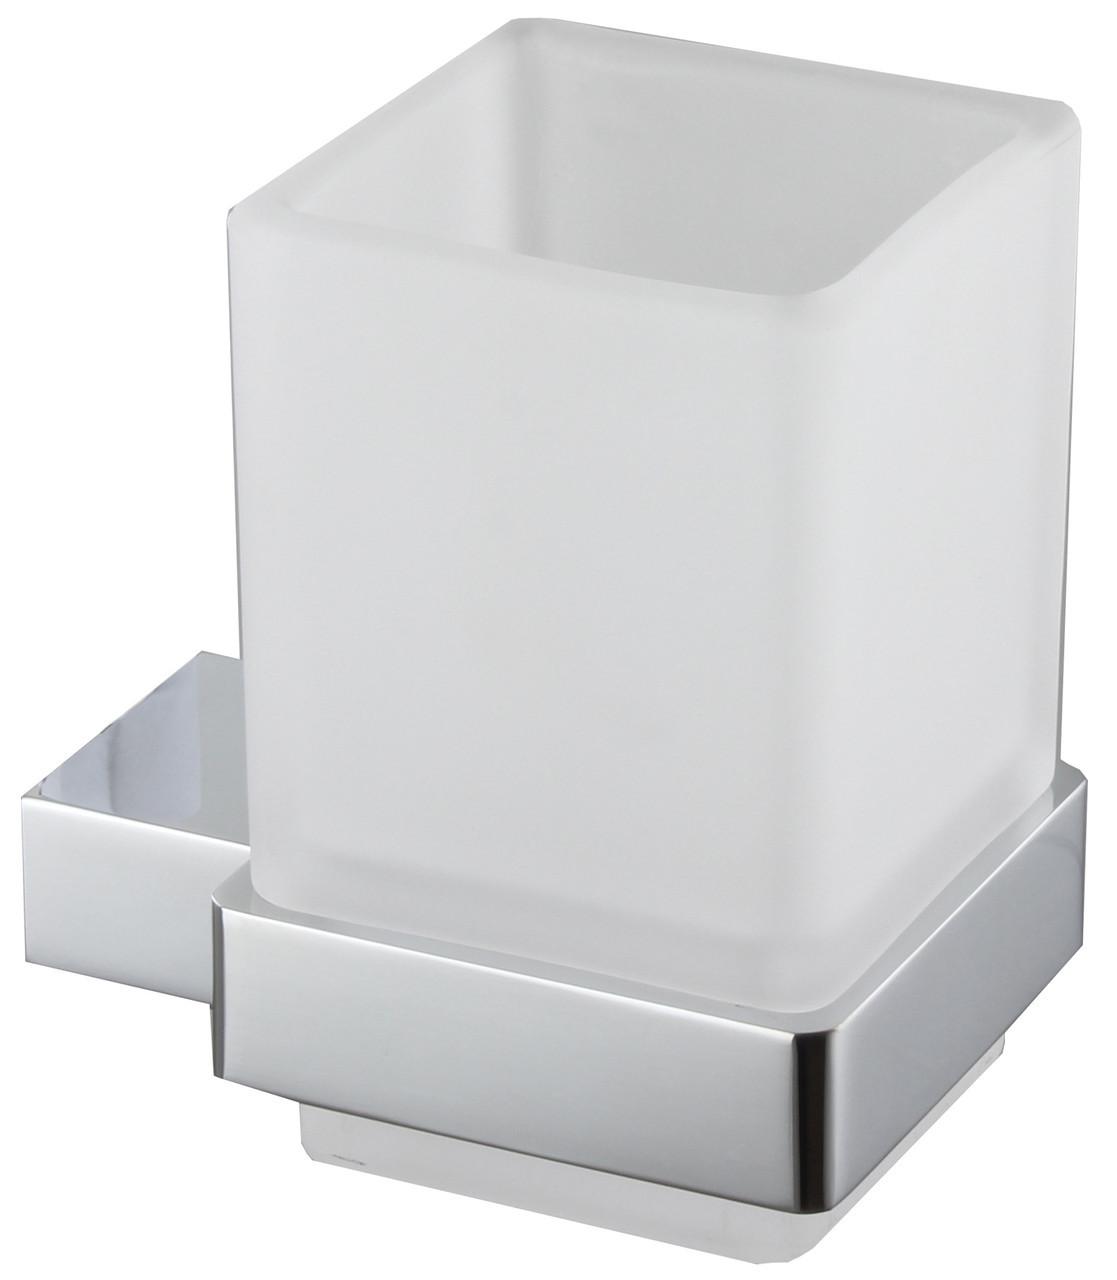 Стакан для зубных щеток Imprese Bitov 120300 хром